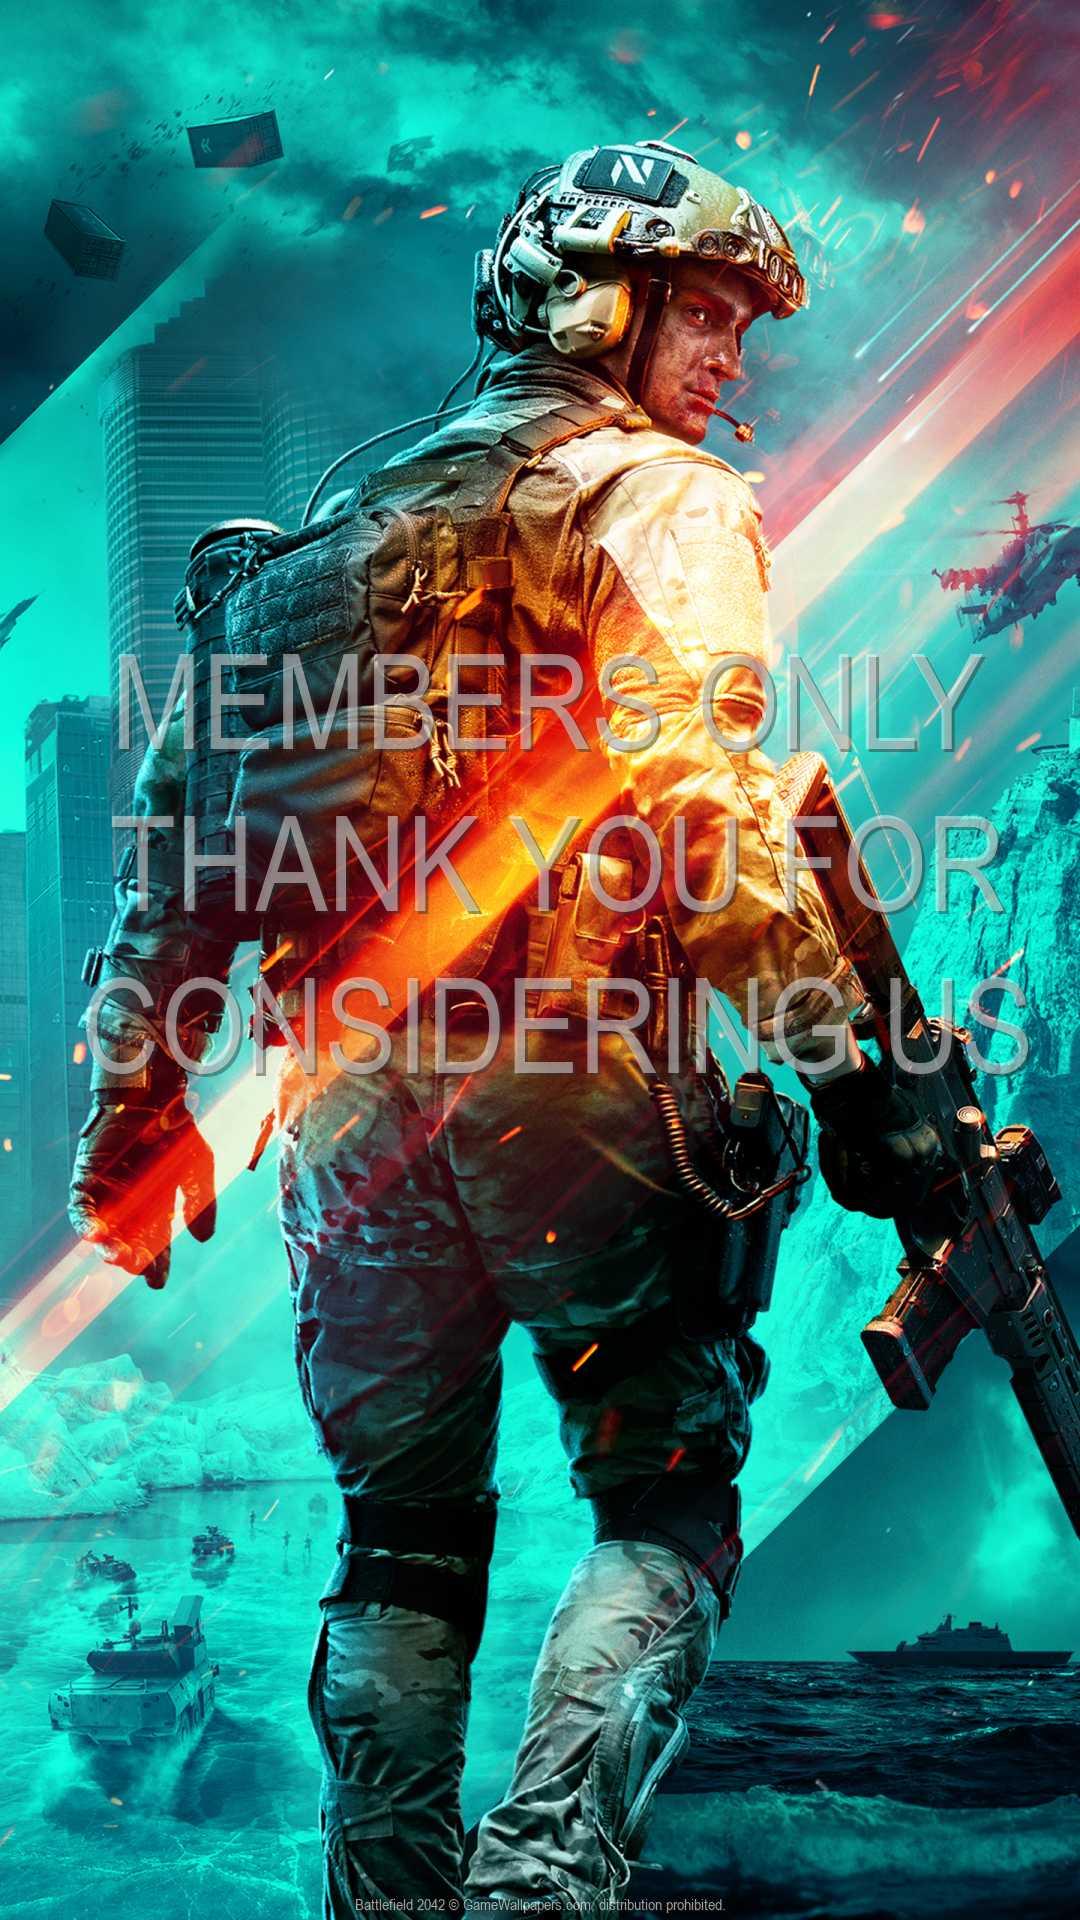 Battlefield 2042 1080p Vertical Mobile wallpaper or background 02